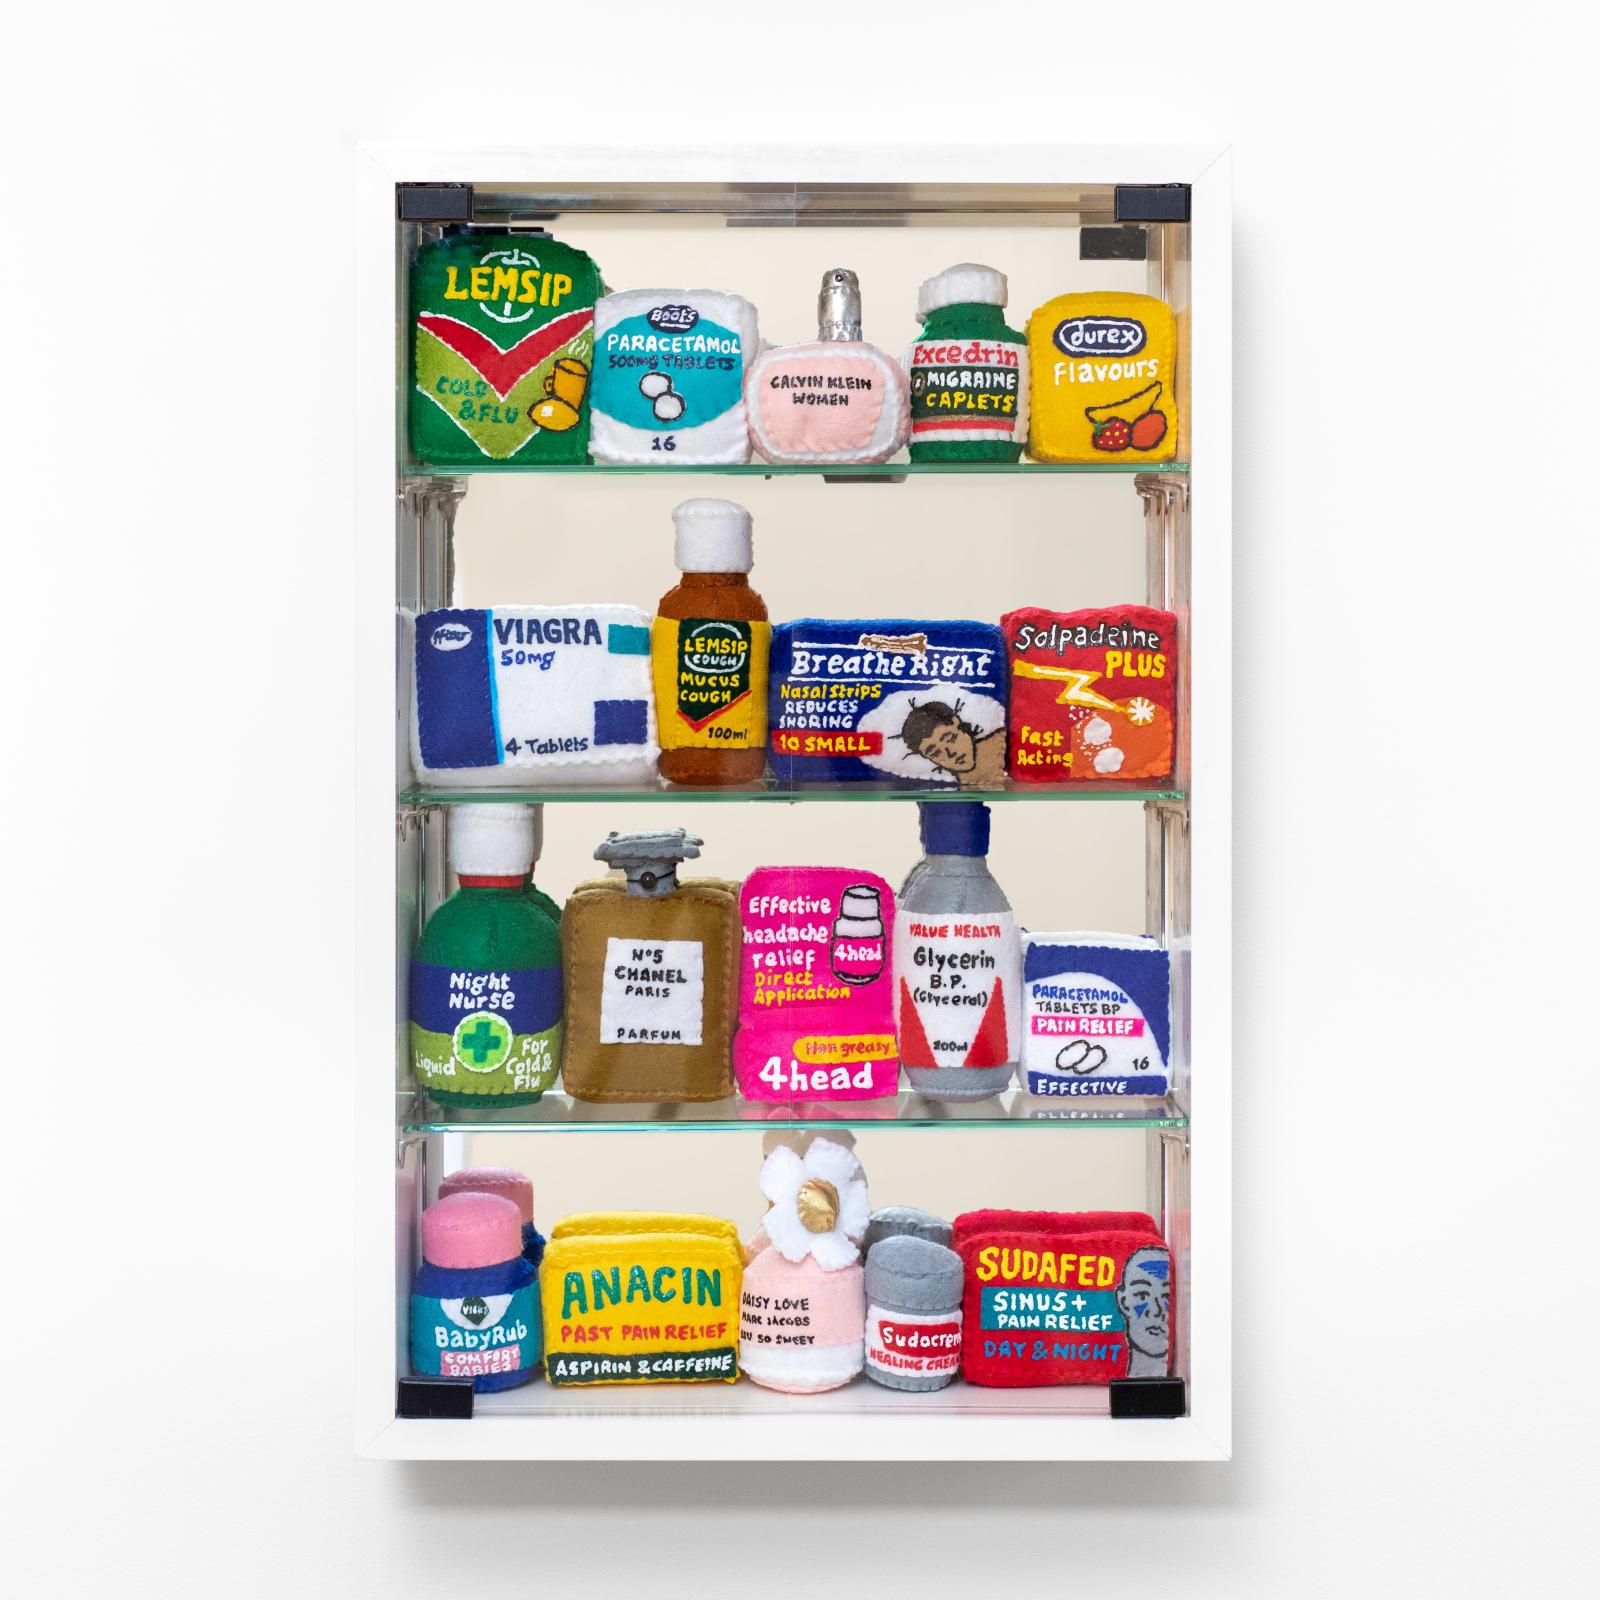 Lucy Sparrow, Bourdon Street Chemist Cabinet, 2020